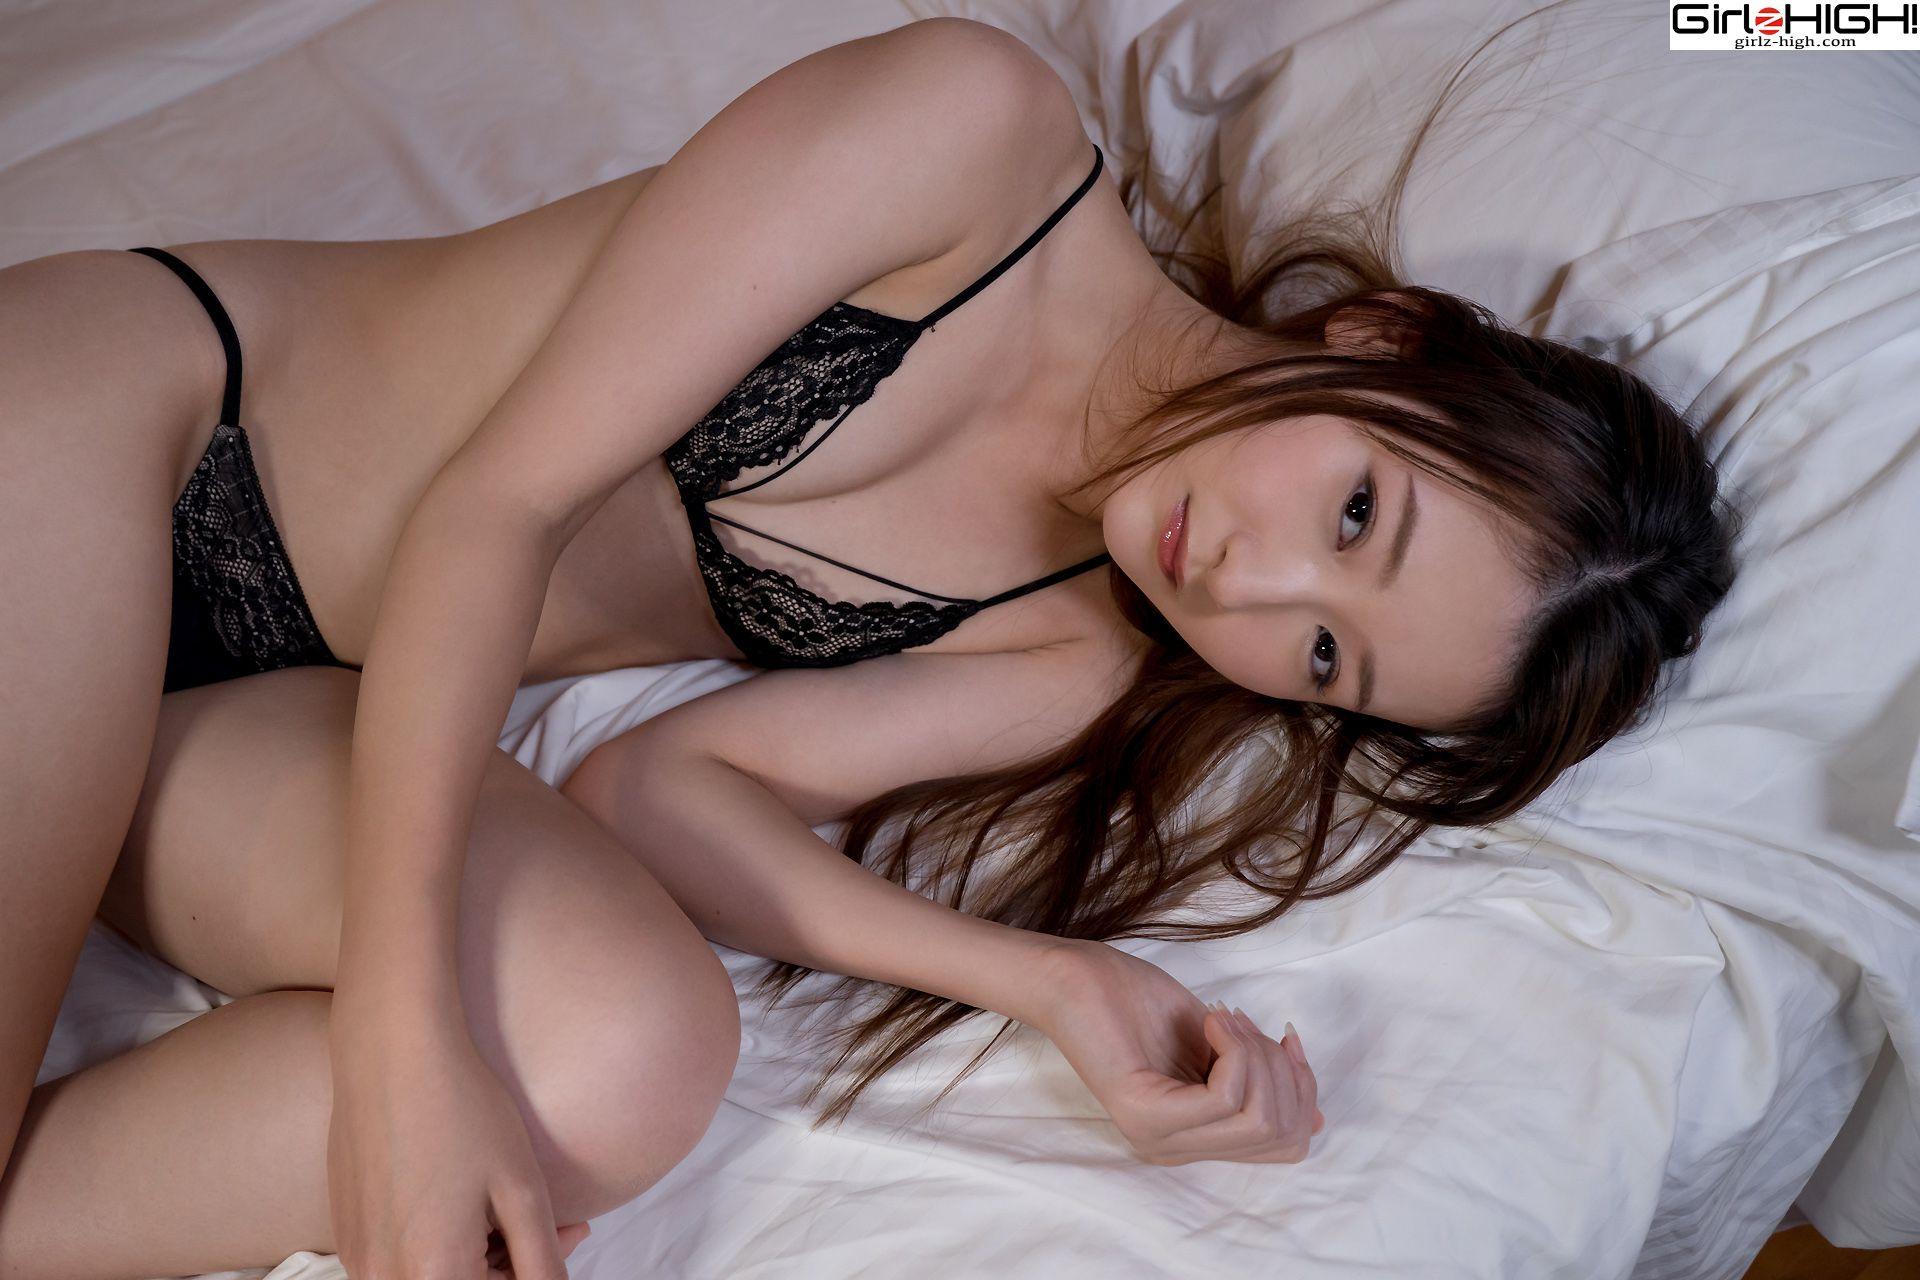 VOL.952 [Girlz-High]内衣美女床上:近藤麻美(近藤あさみ)超高清写真套图(41P)